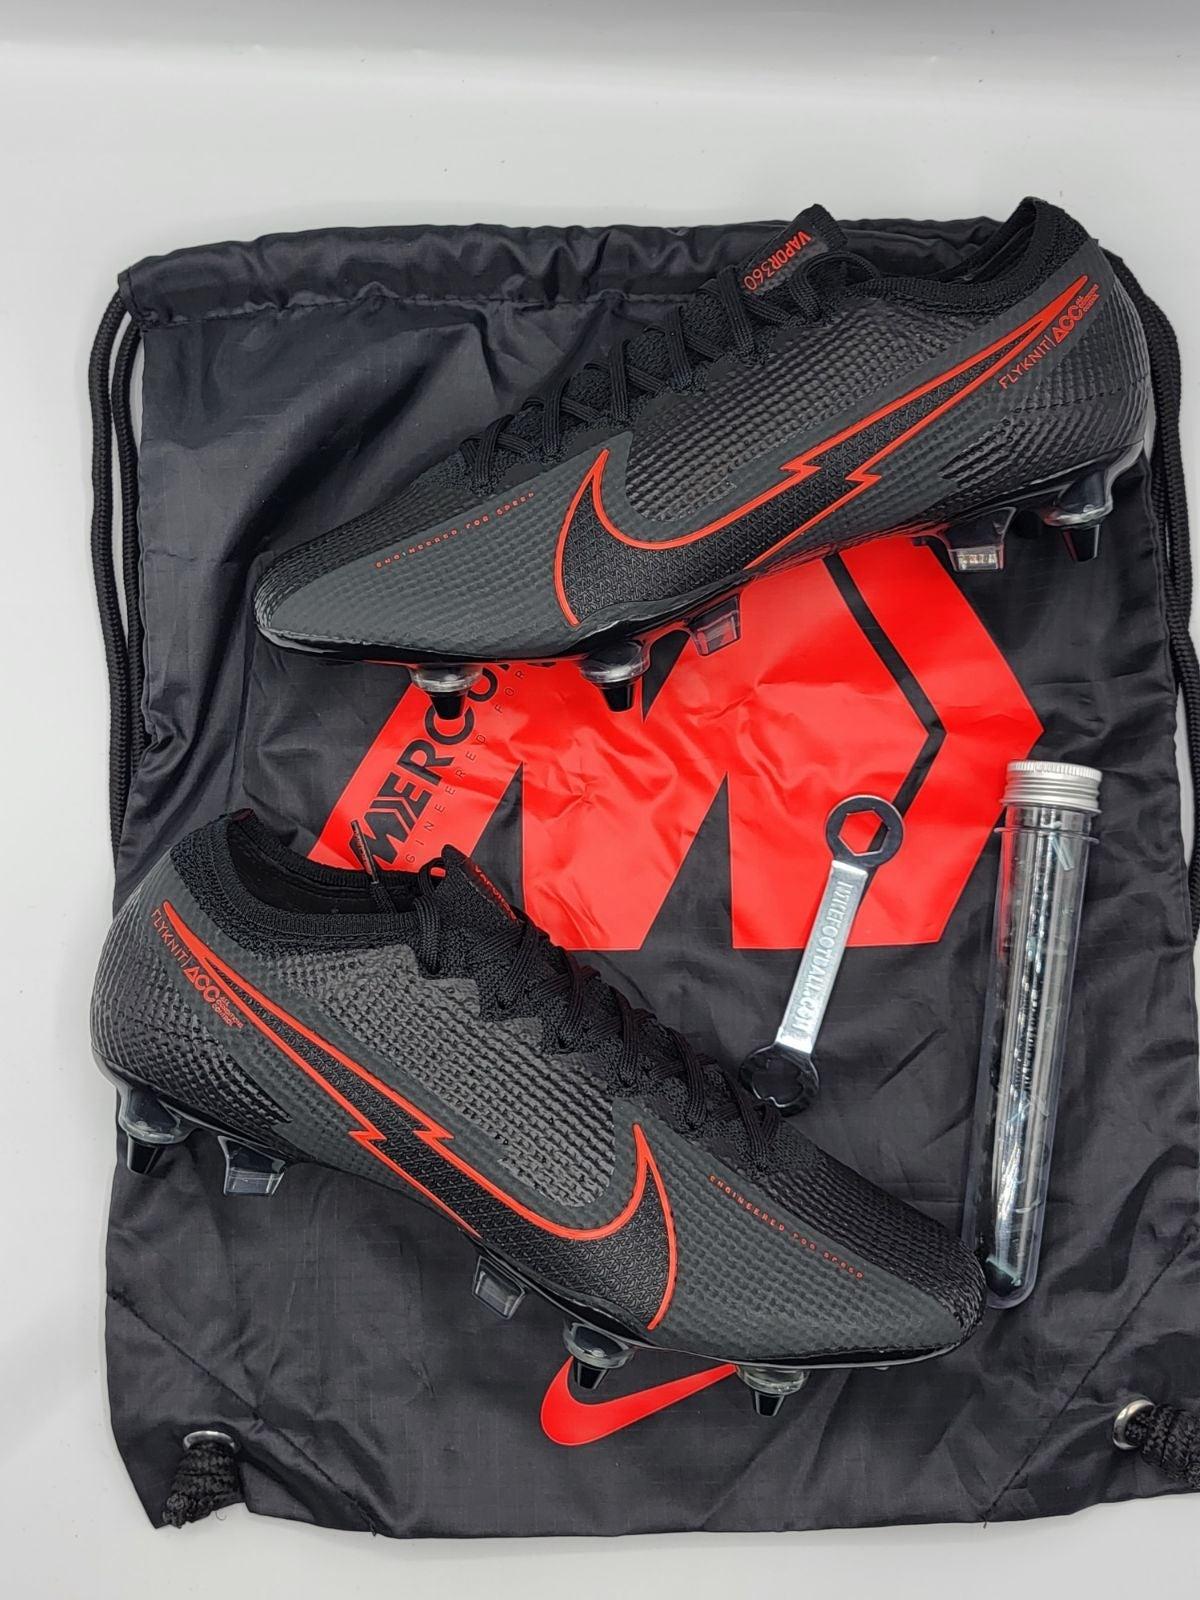 Nike vapor 12 ag elite cleats size 9